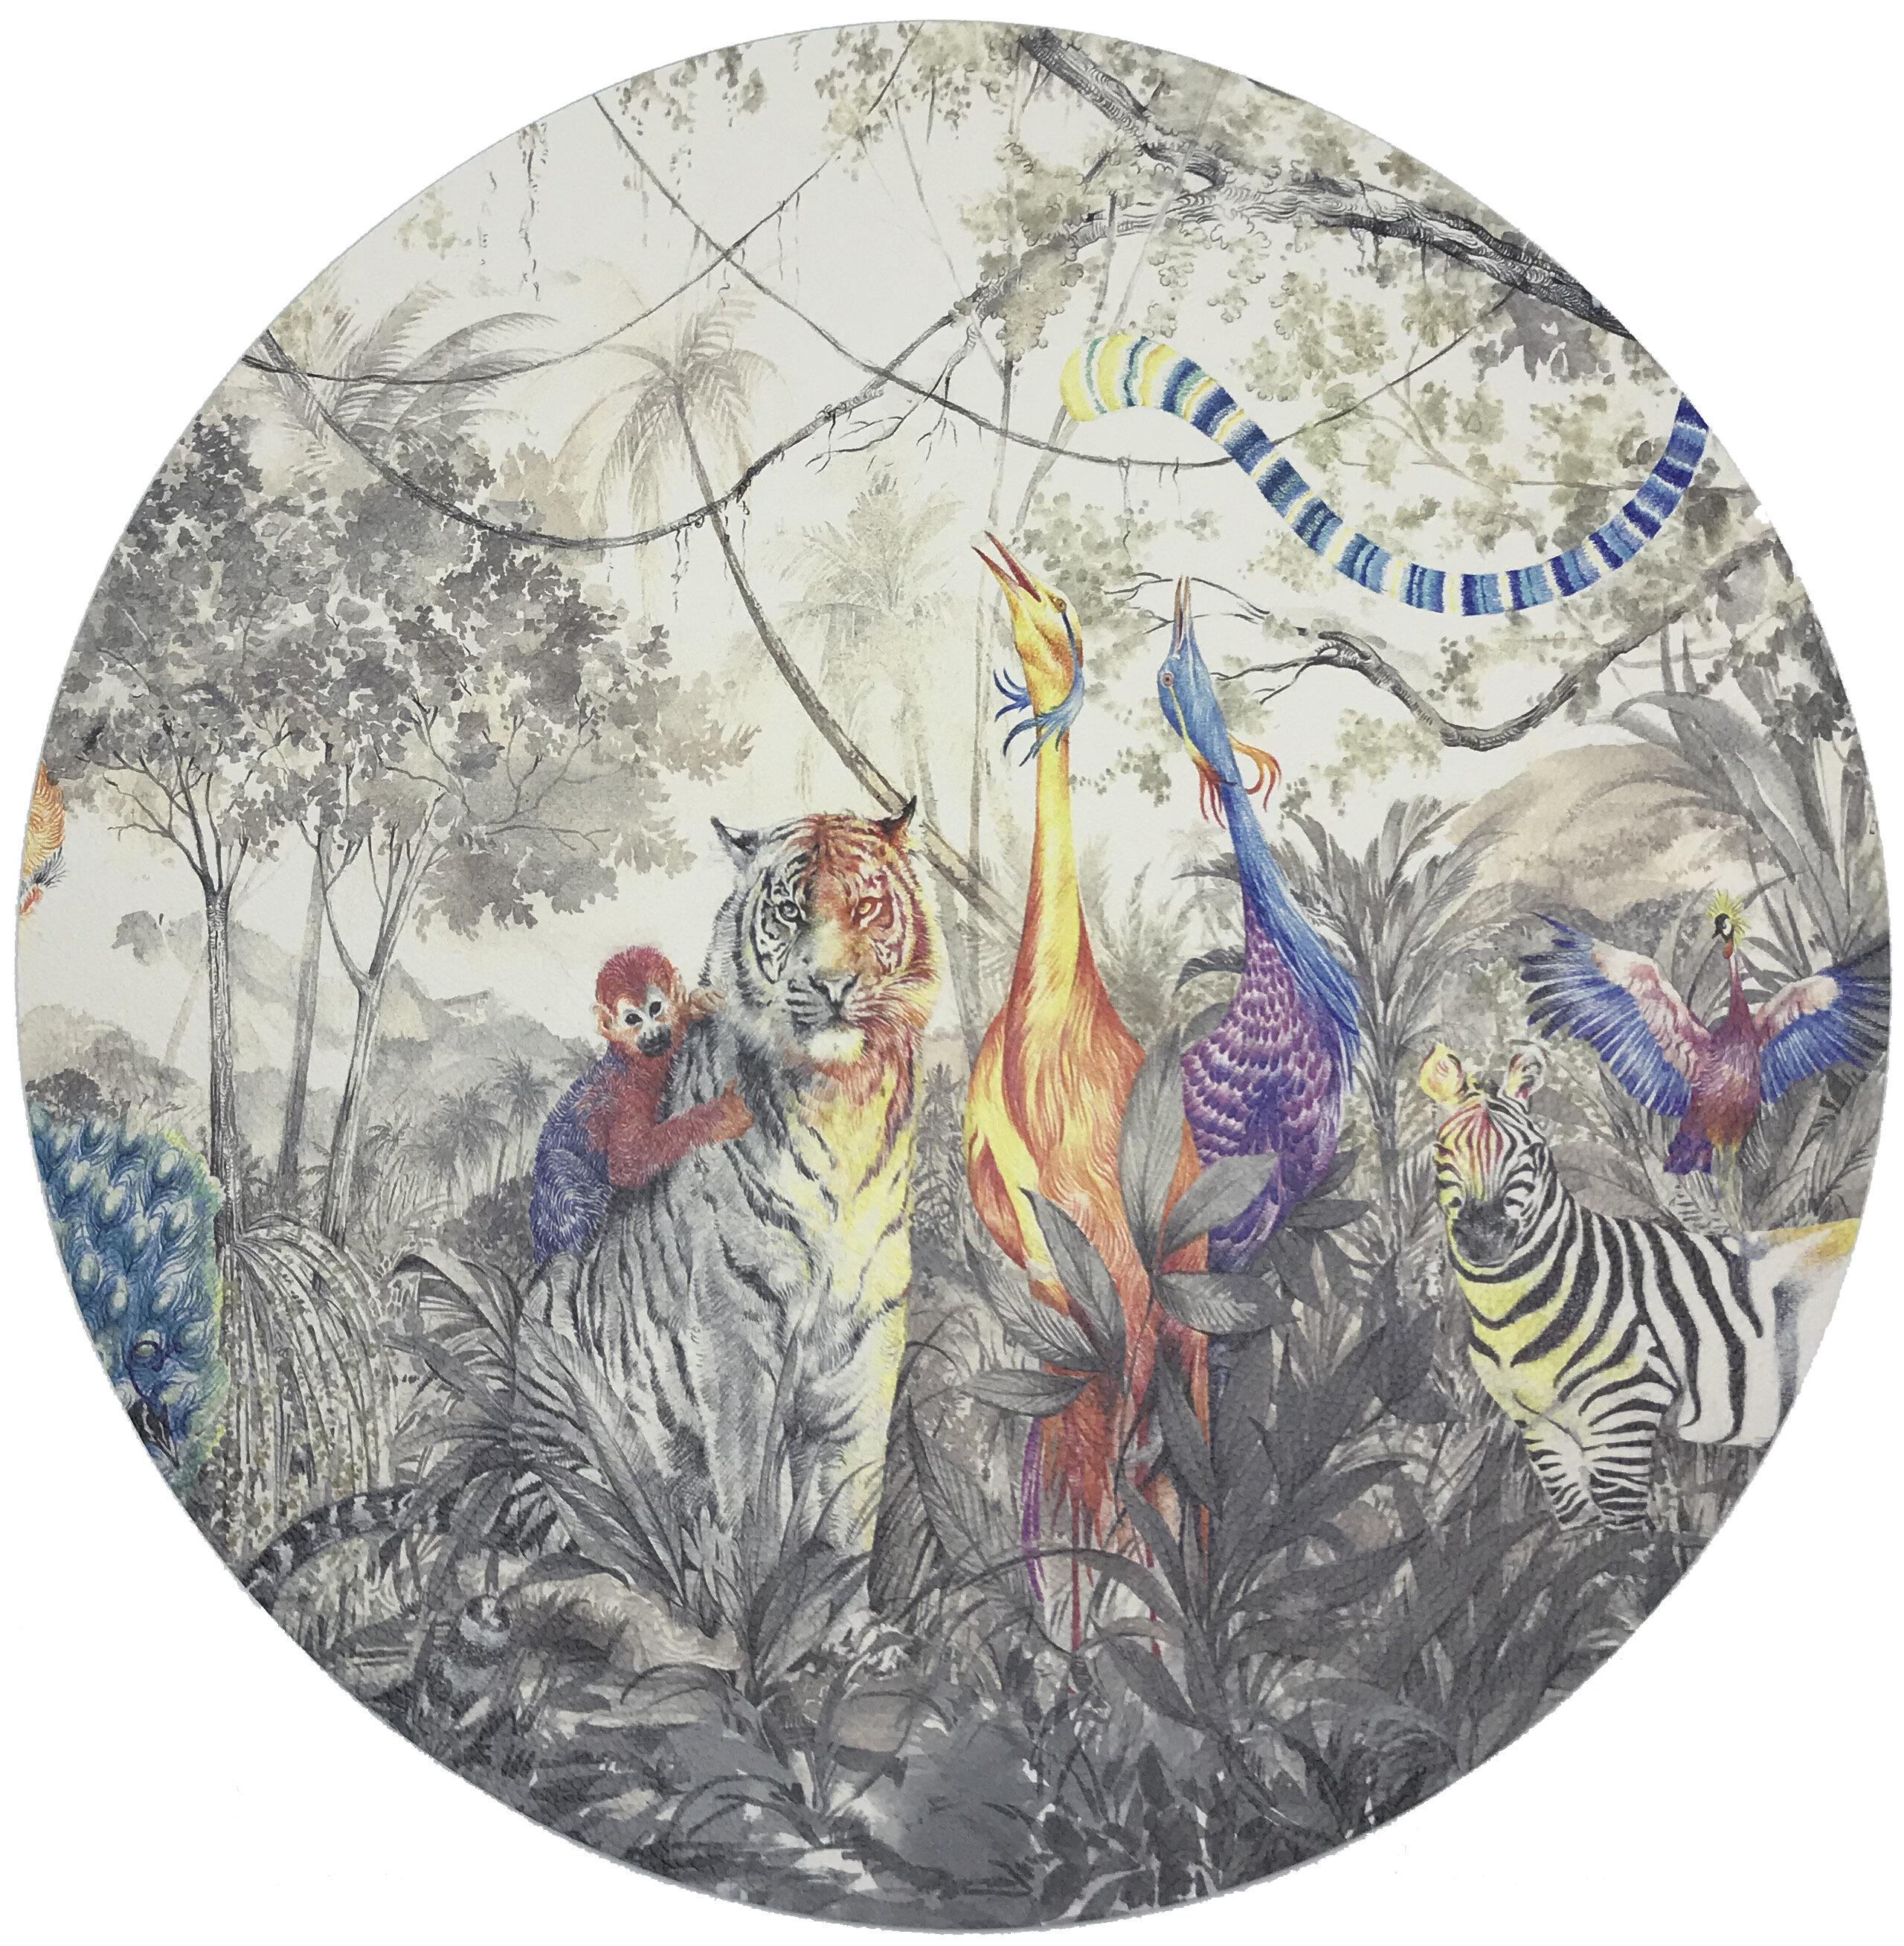 Nicolette Mayer Arcadia Tiger And Zebra Scene Pebble 16 Vinyl Placemat Wayfair